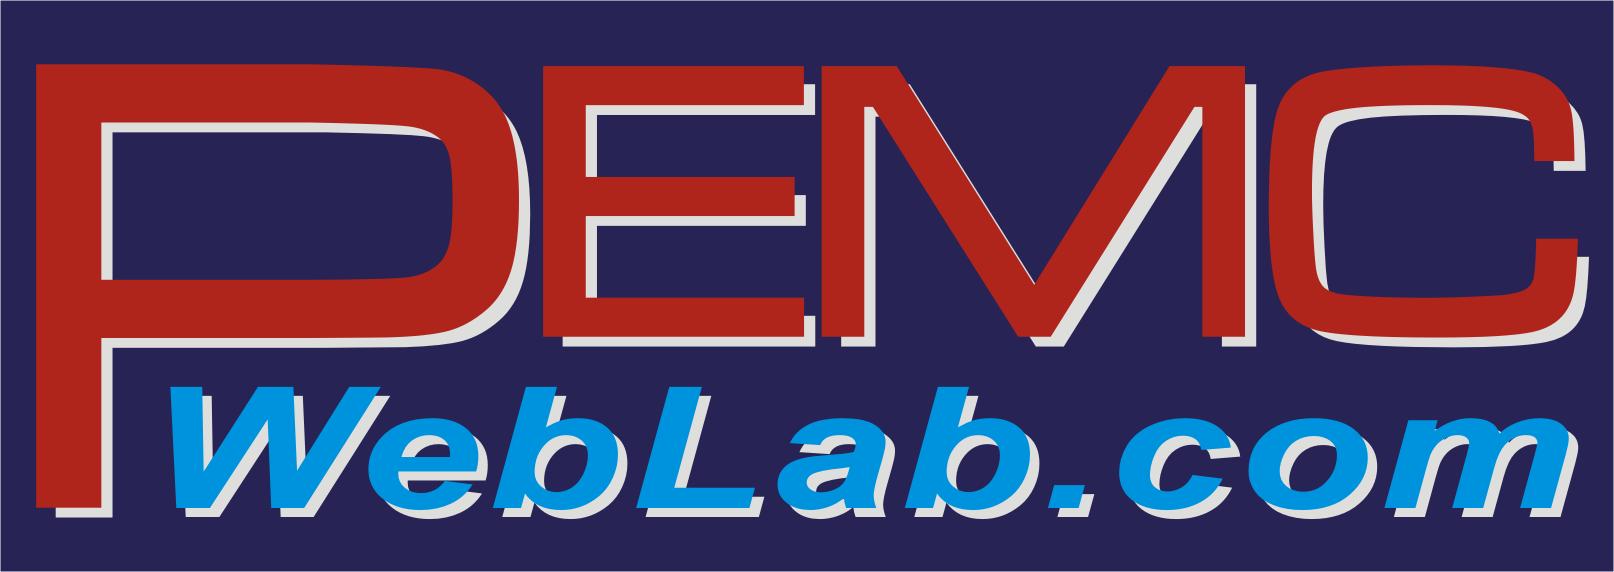 Online interactive laboratories!